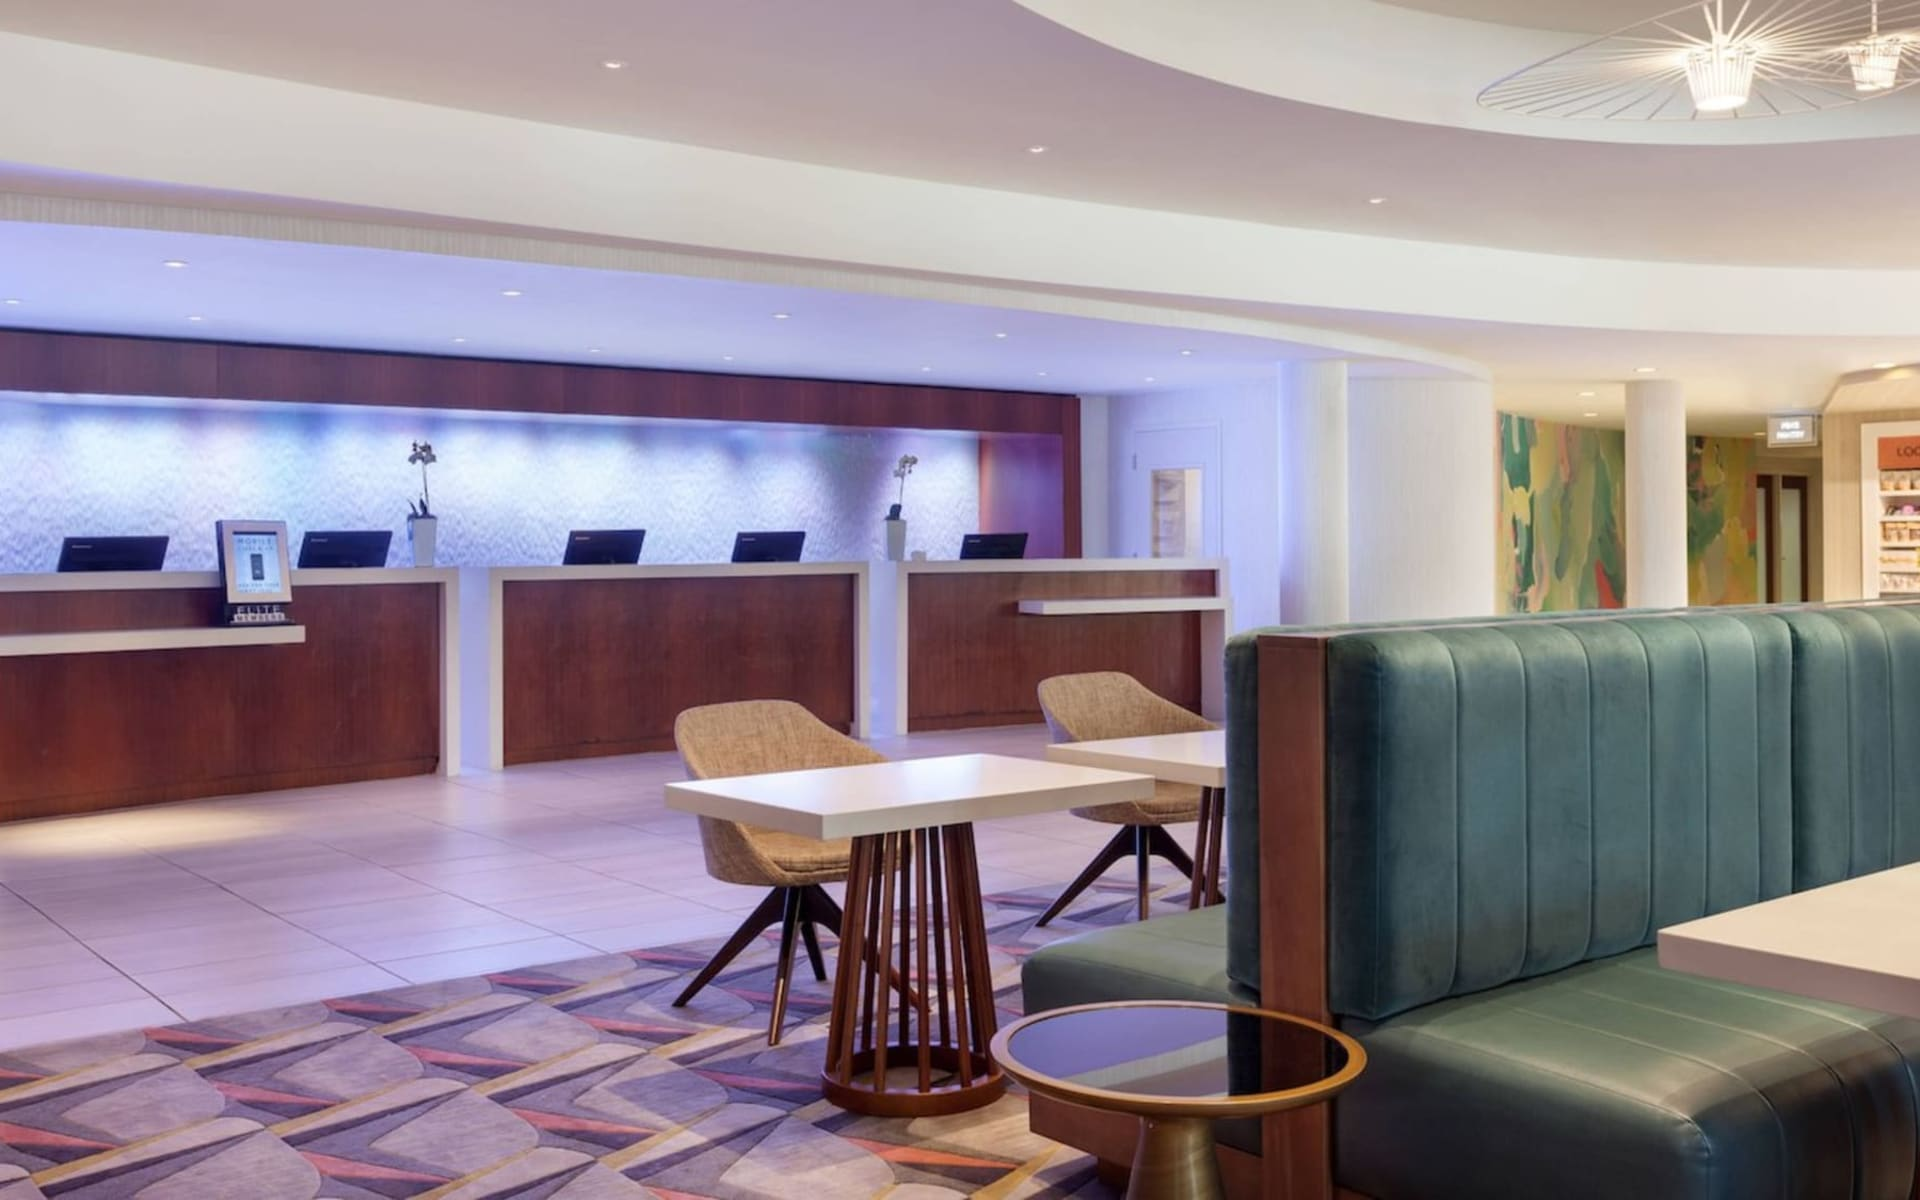 Marriott Miami Airport: Facilities_Marriott MIA Airport_Lobby_ATI